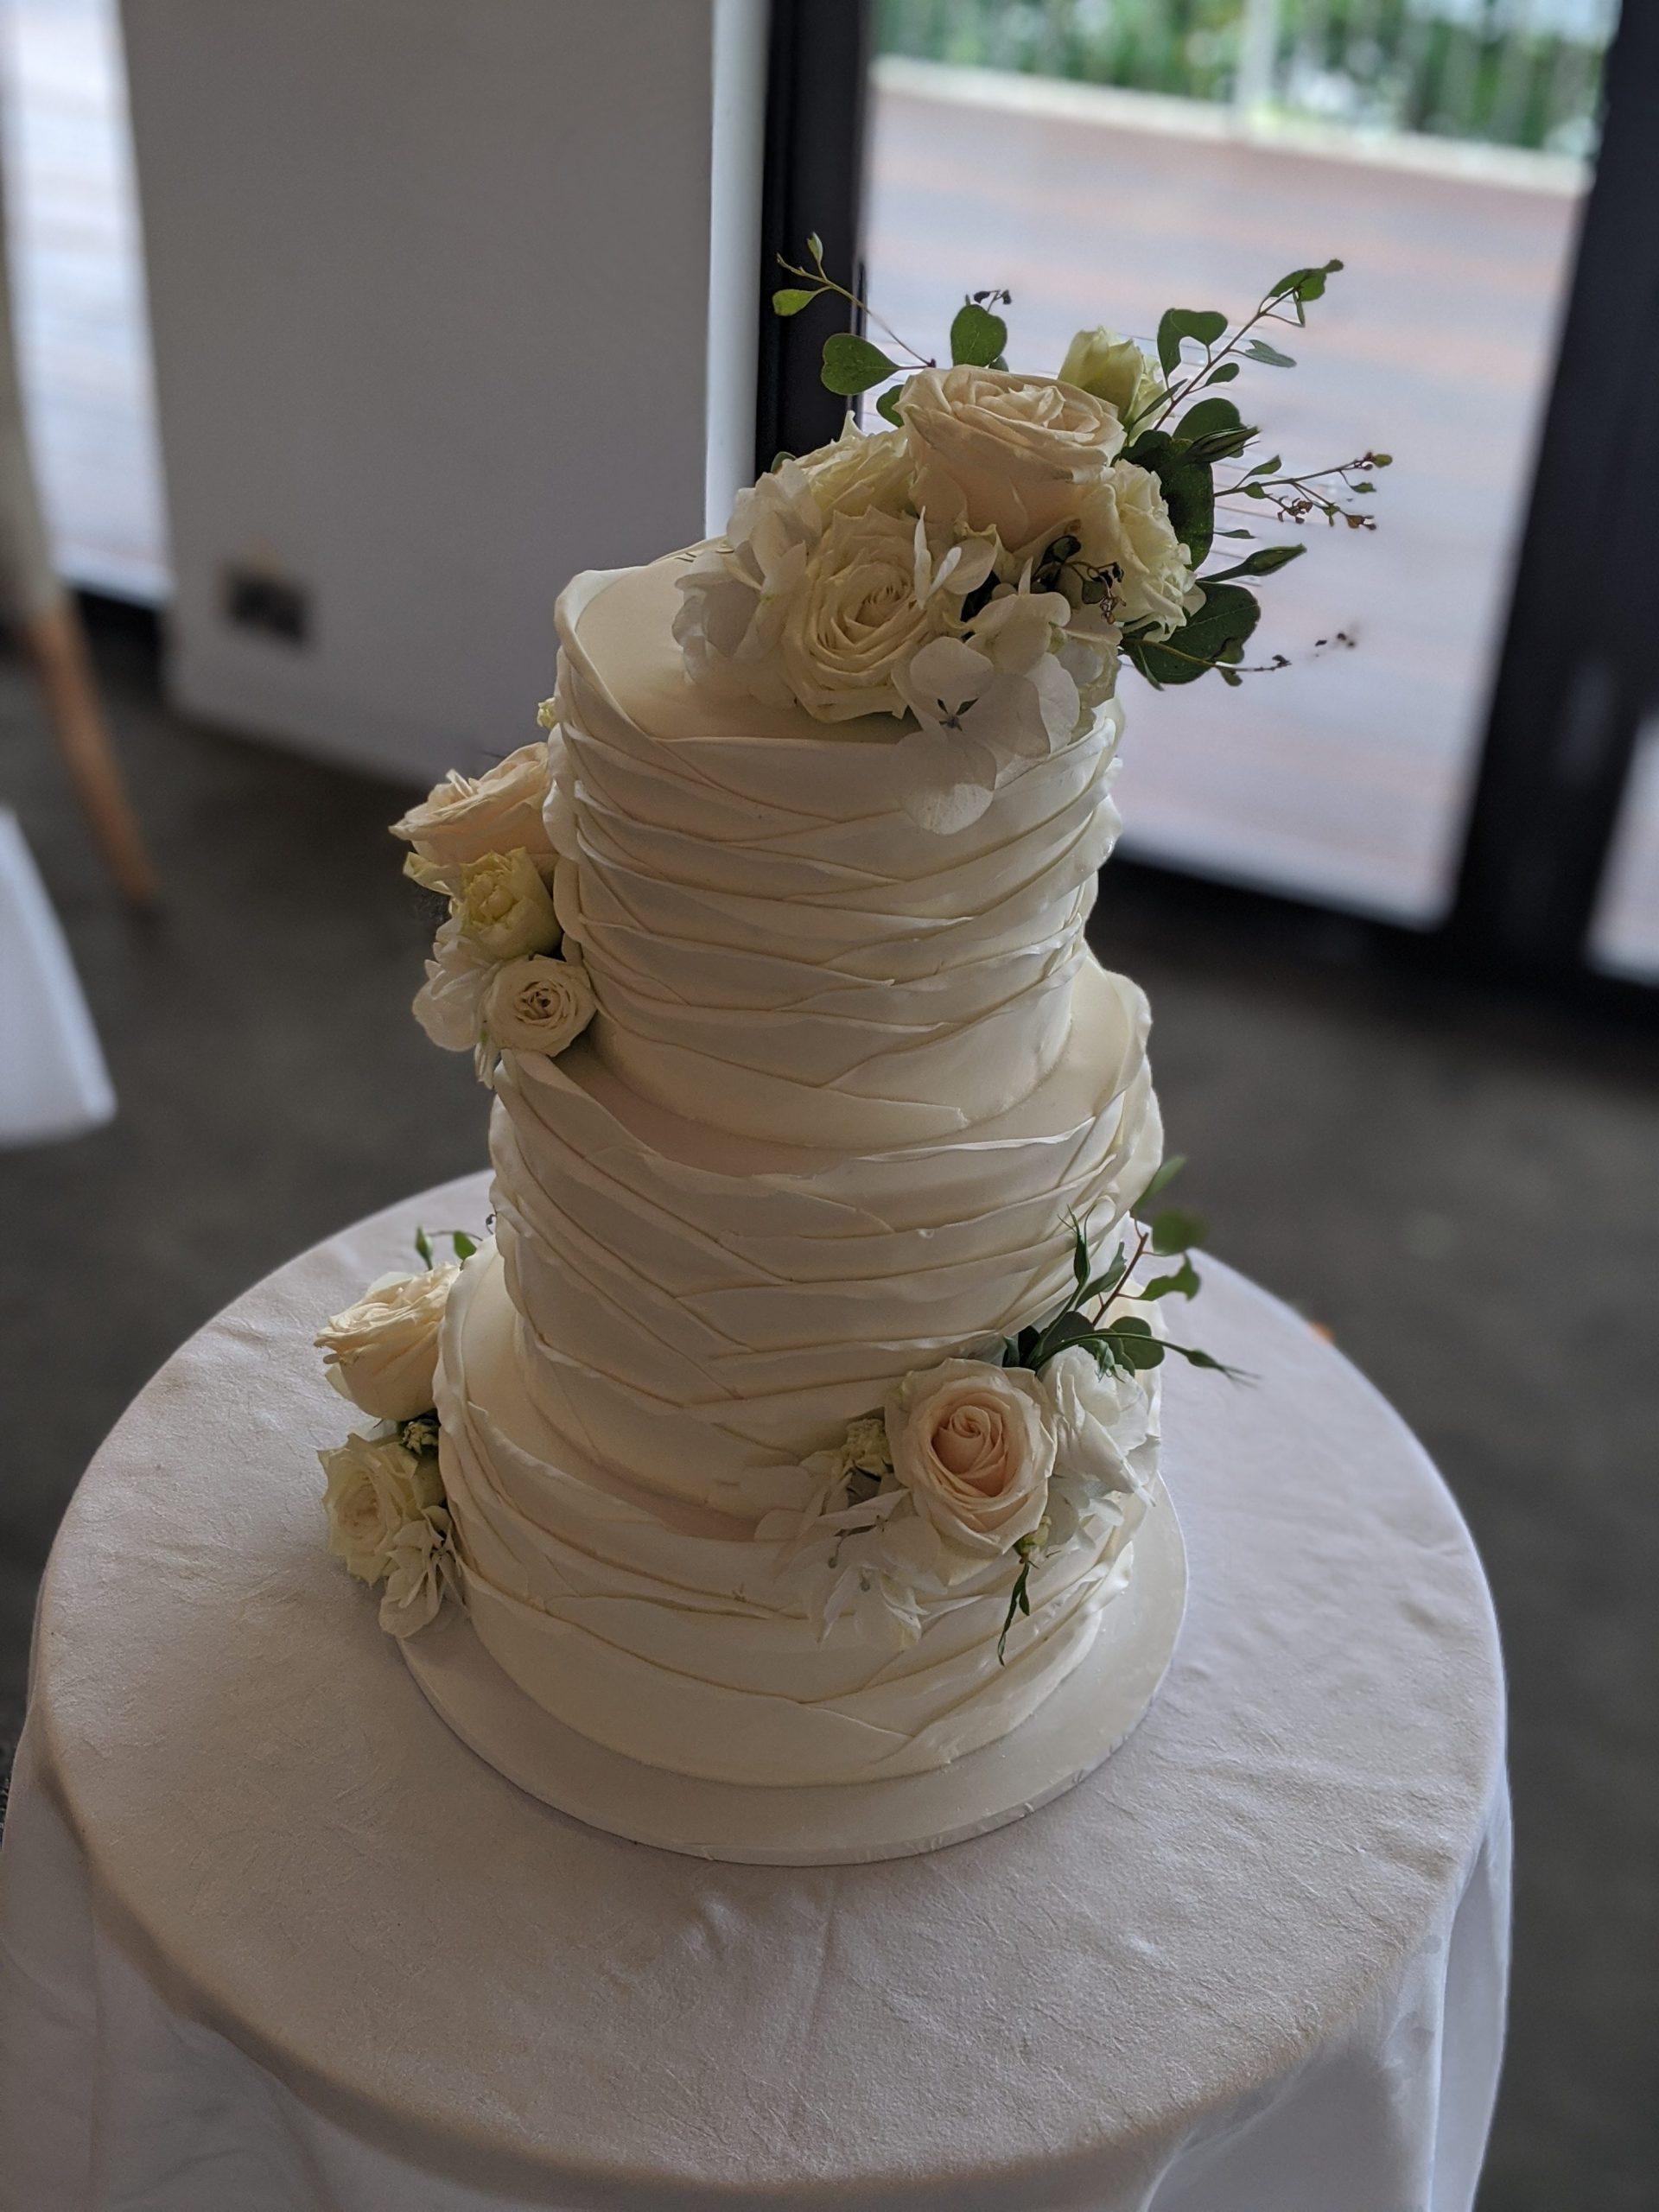 3 tier fondant frill wedding cake with fresh florals. sydney wedding. fondant cake